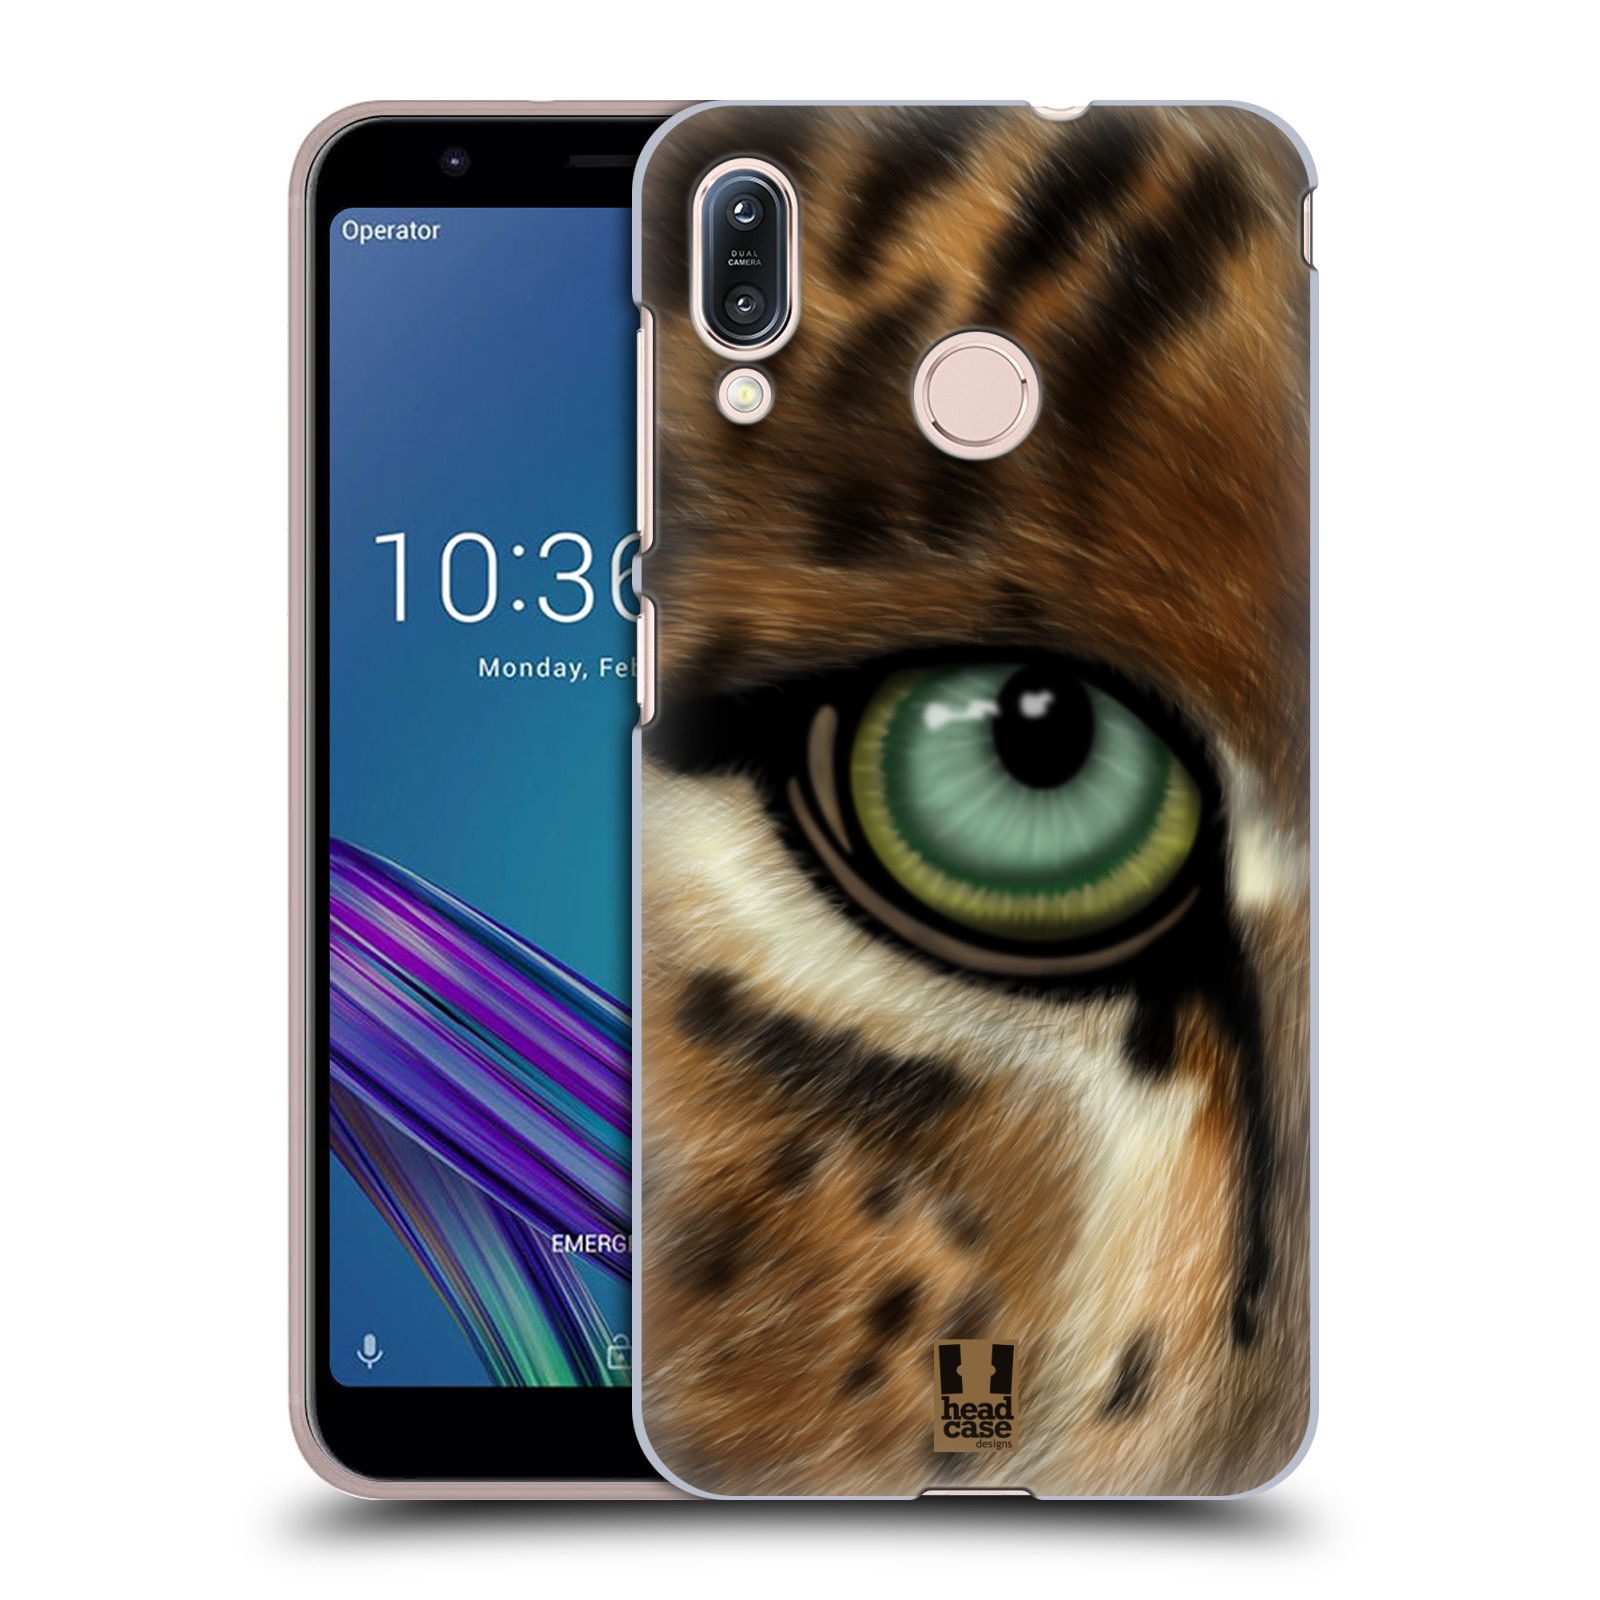 Pouzdro na mobil Asus Zenfone Max M1 (ZB555KL) - HEAD CASE - vzor pohled zvířete oko leopard